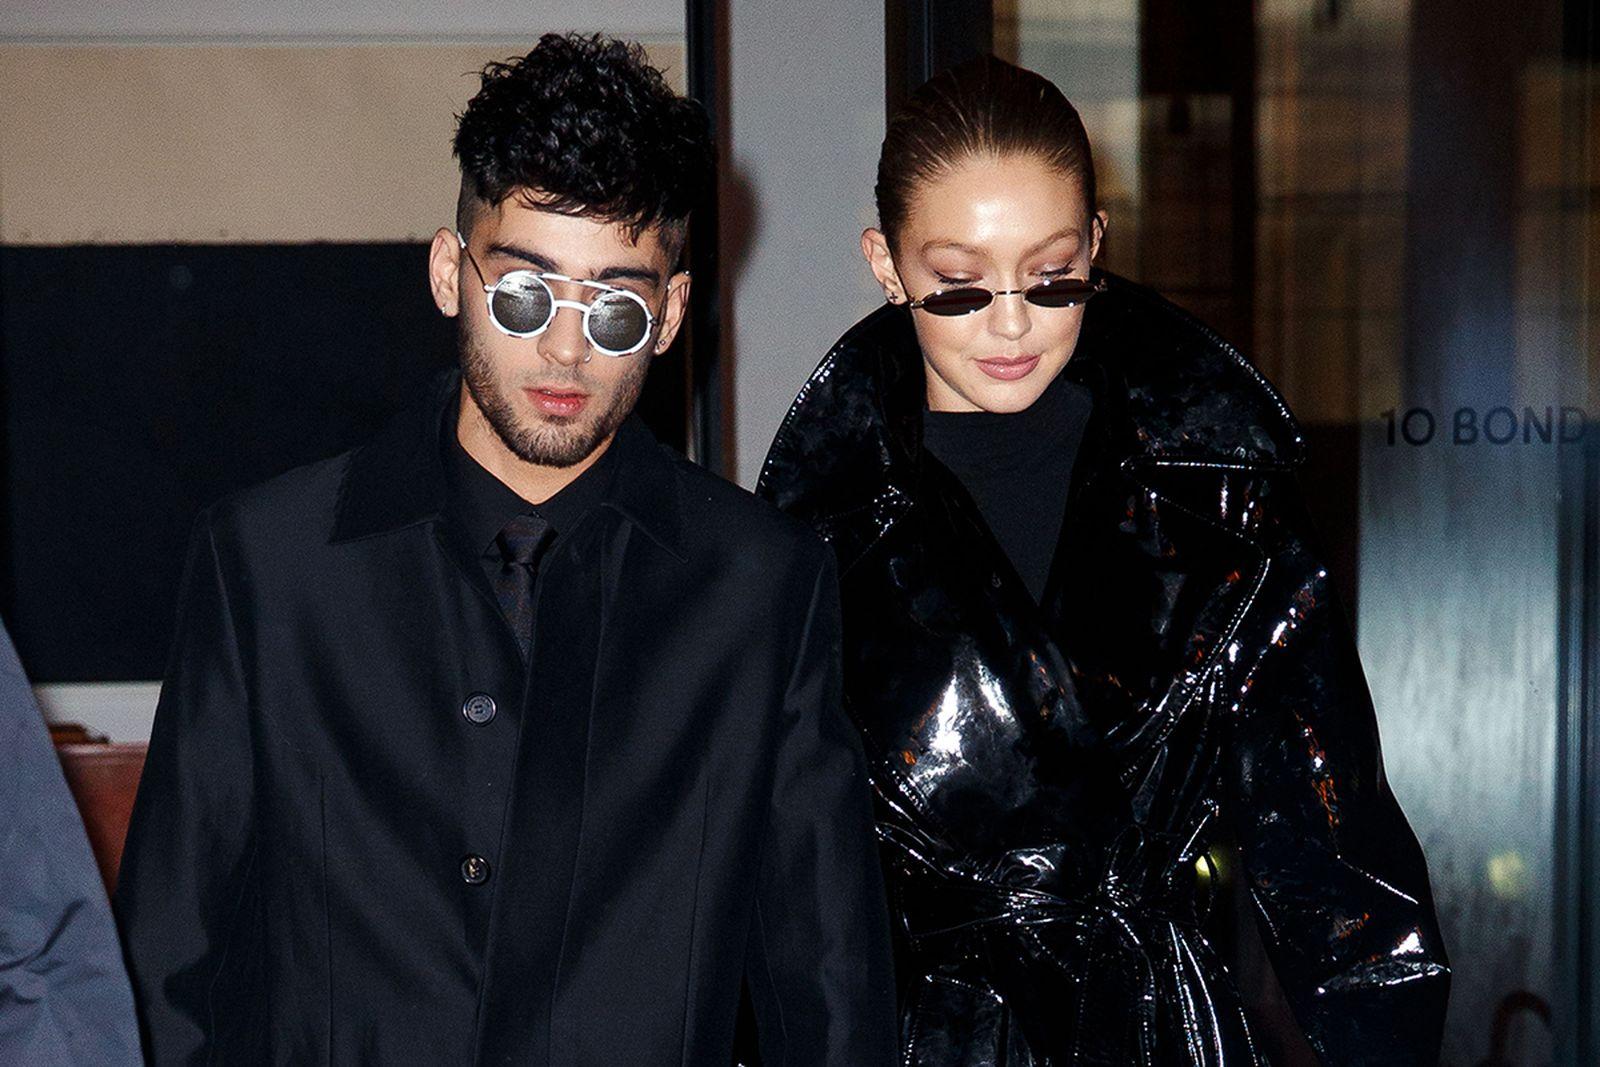 Zayn Malik and Gigi Hadid in New York